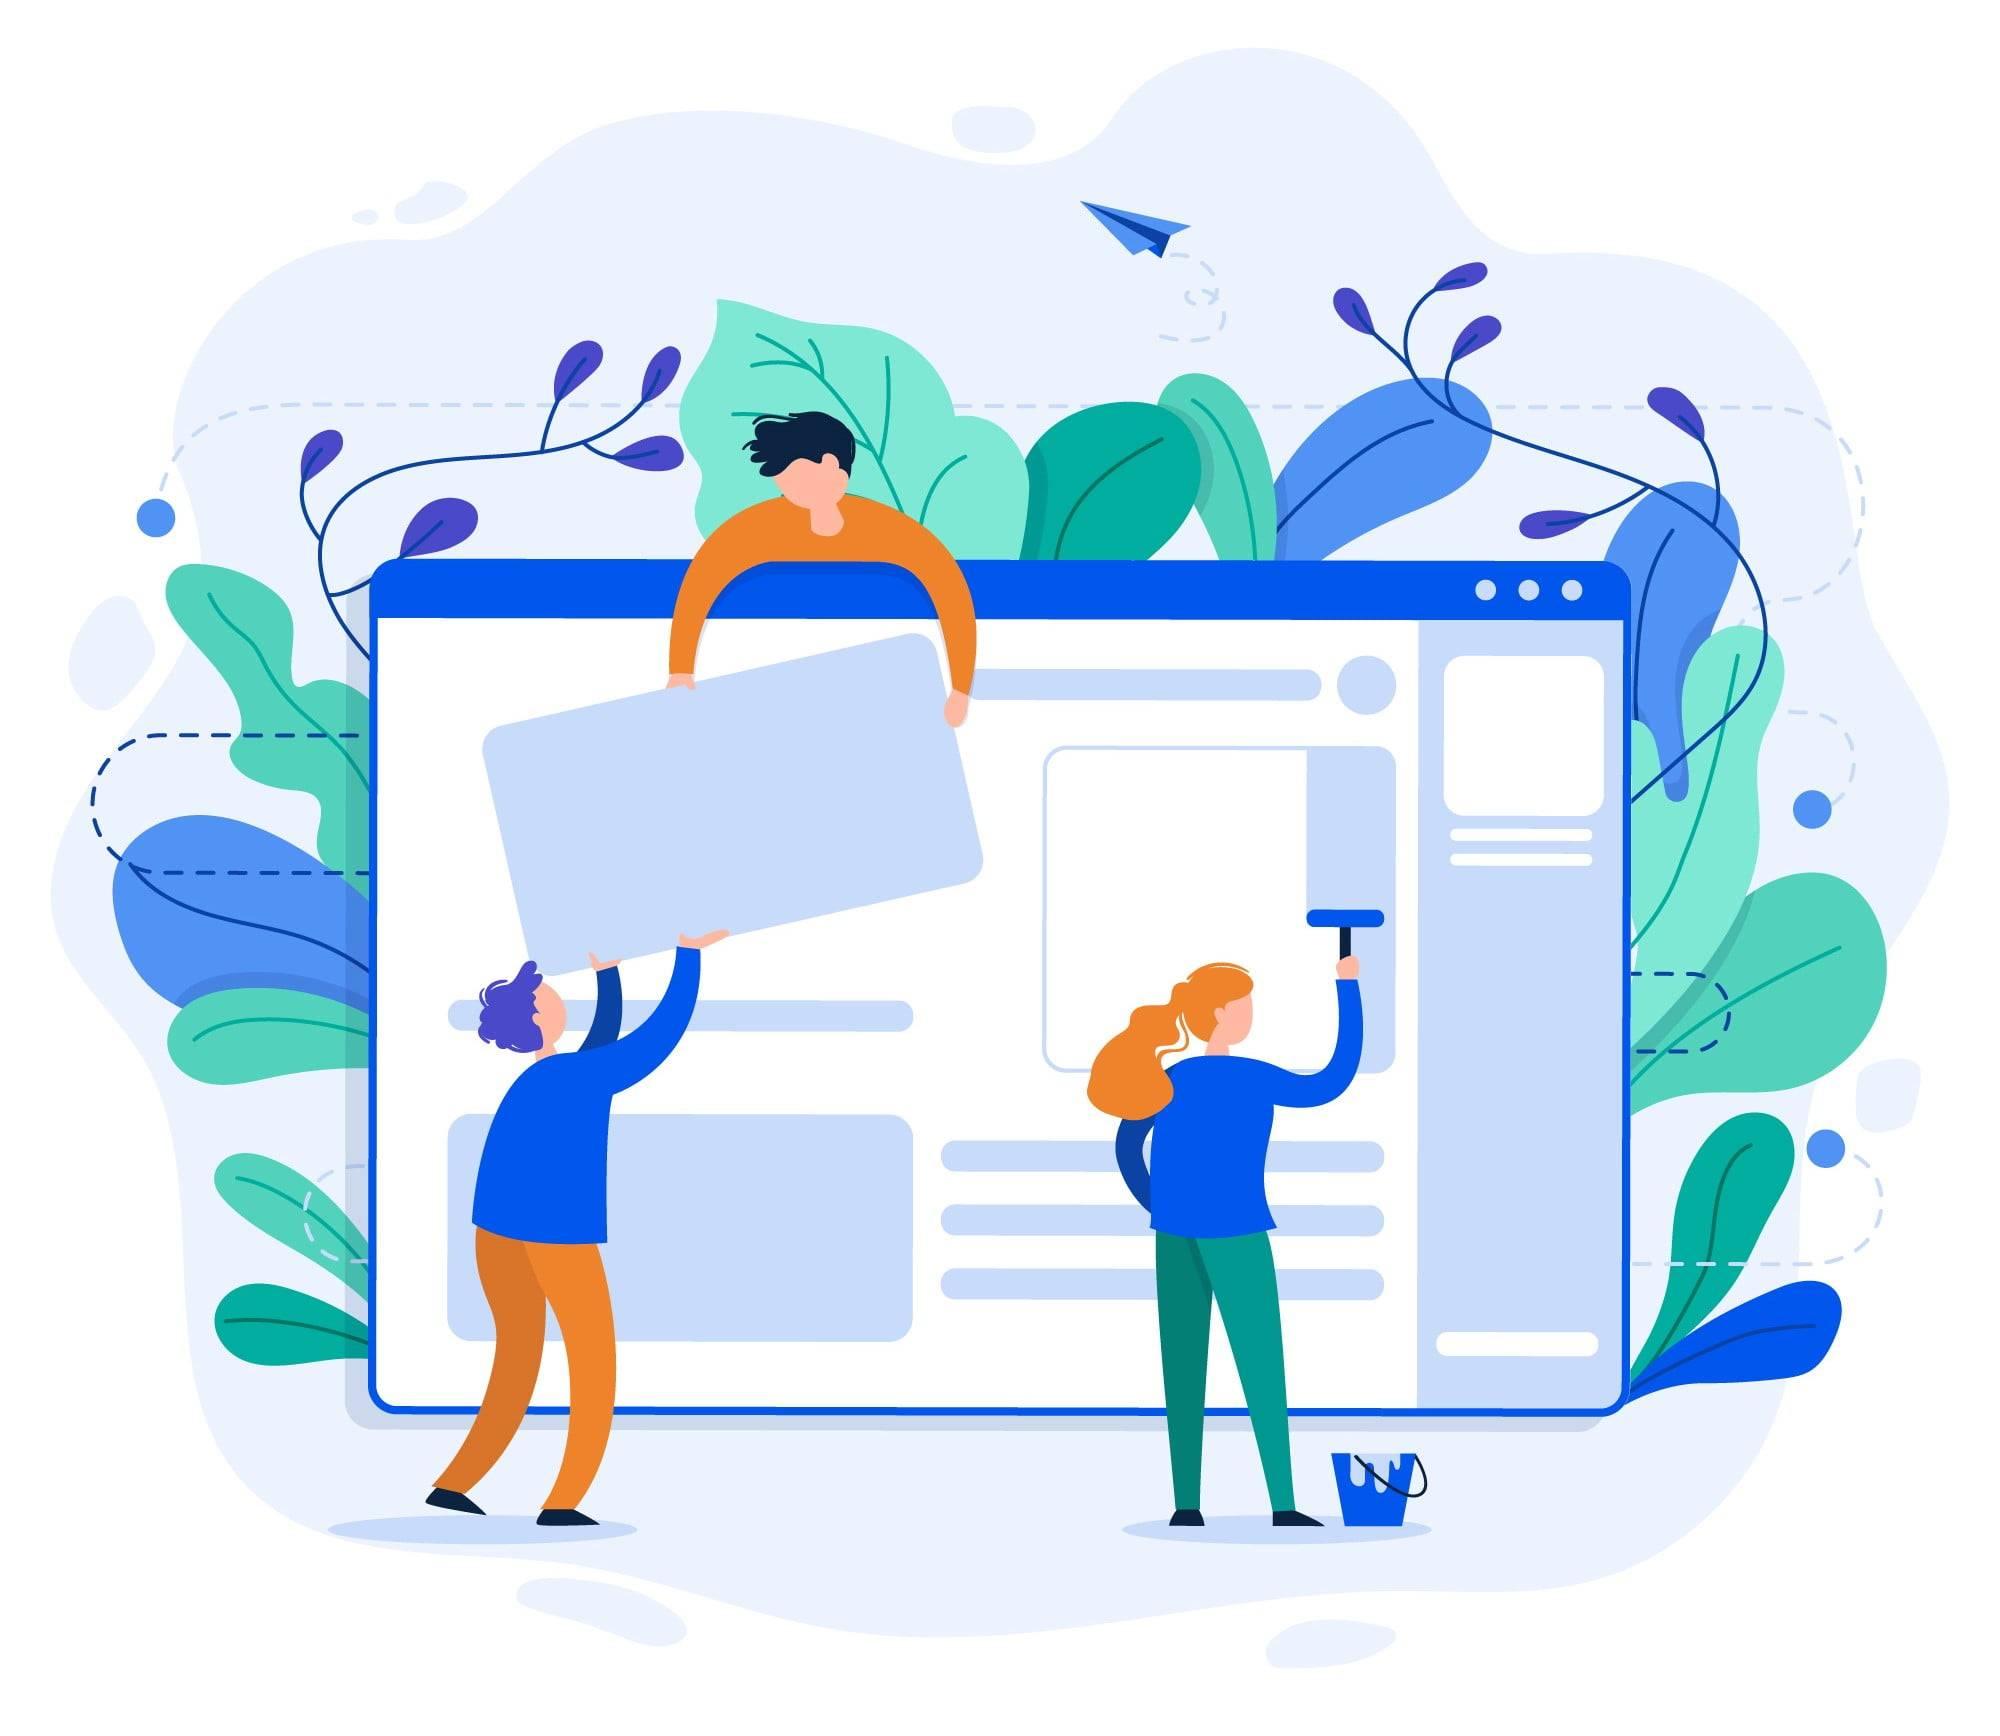 diseño web - estrategia